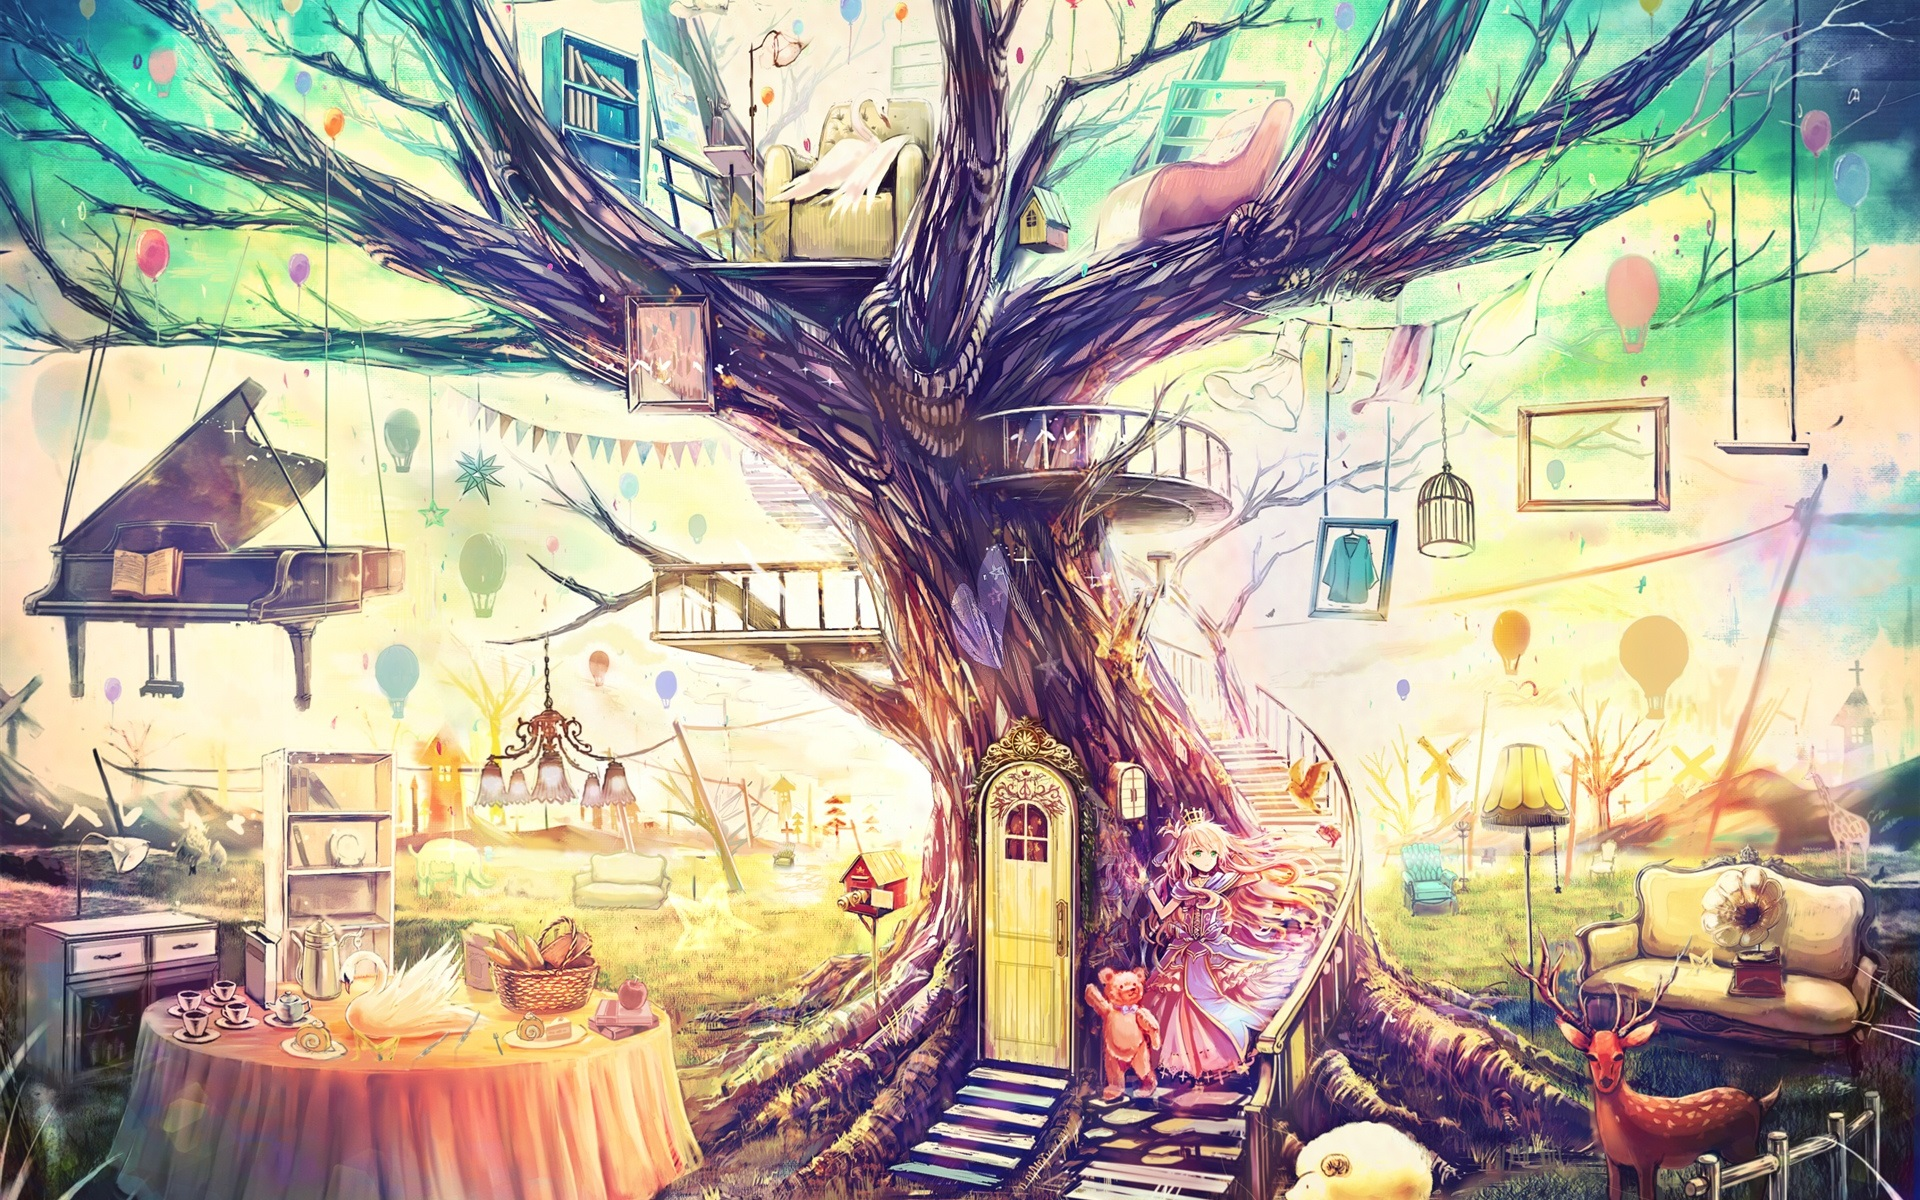 Wallpaper Beautiful Art Painting, Magical World, Fantasy - Anime Fantasy Tree - HD Wallpaper